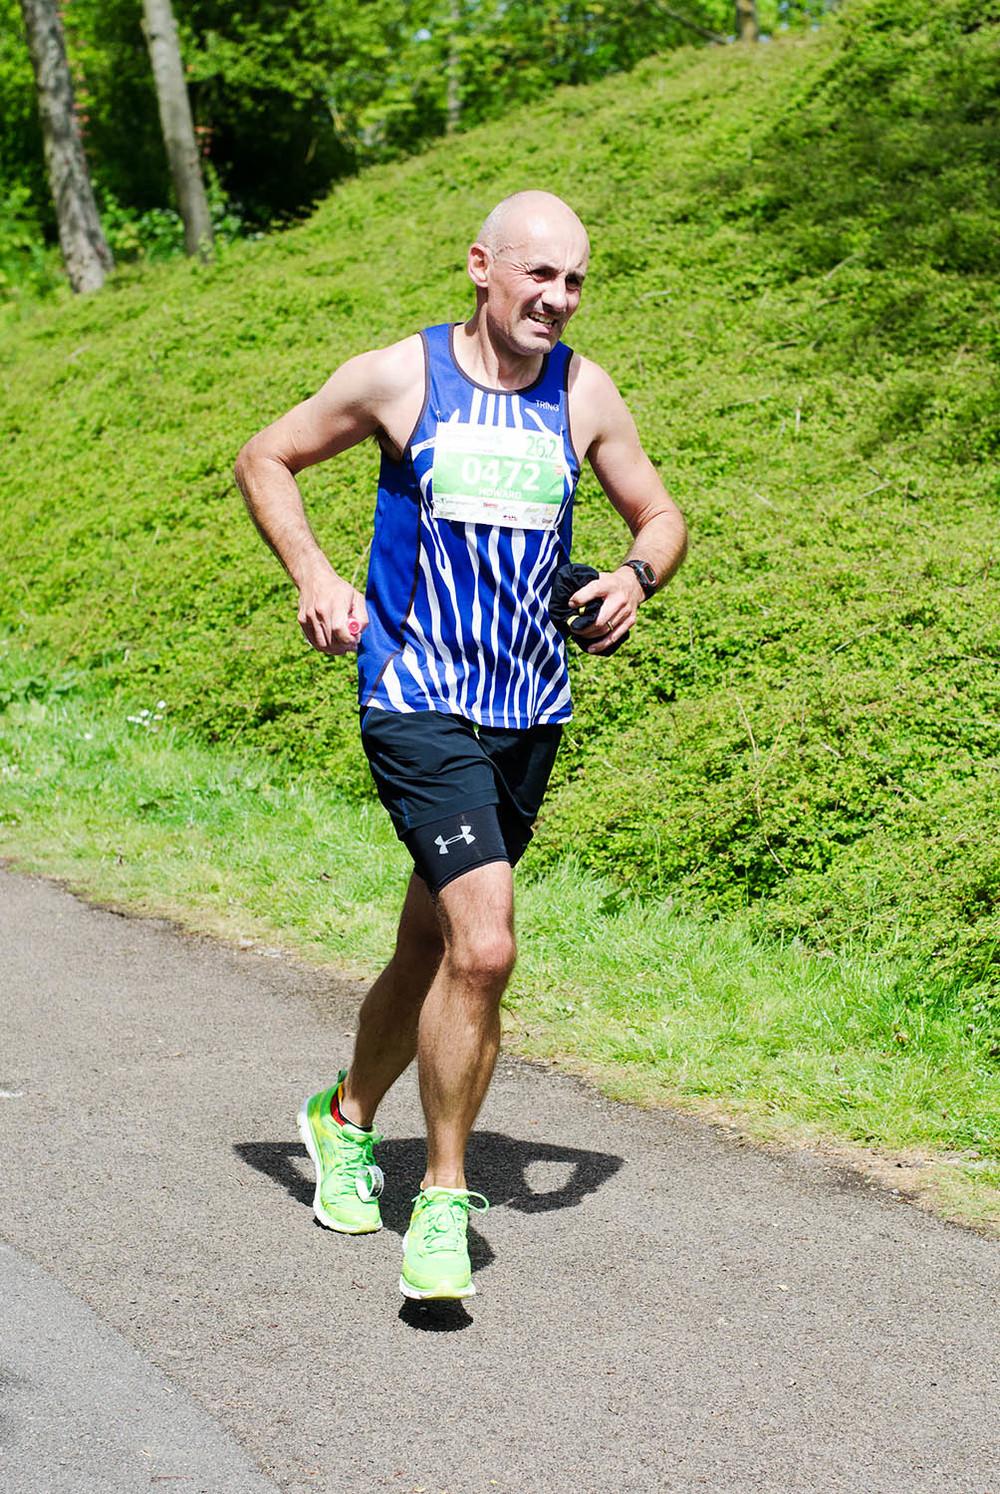 Milton Keynes Marathon 2015 - Mile 25